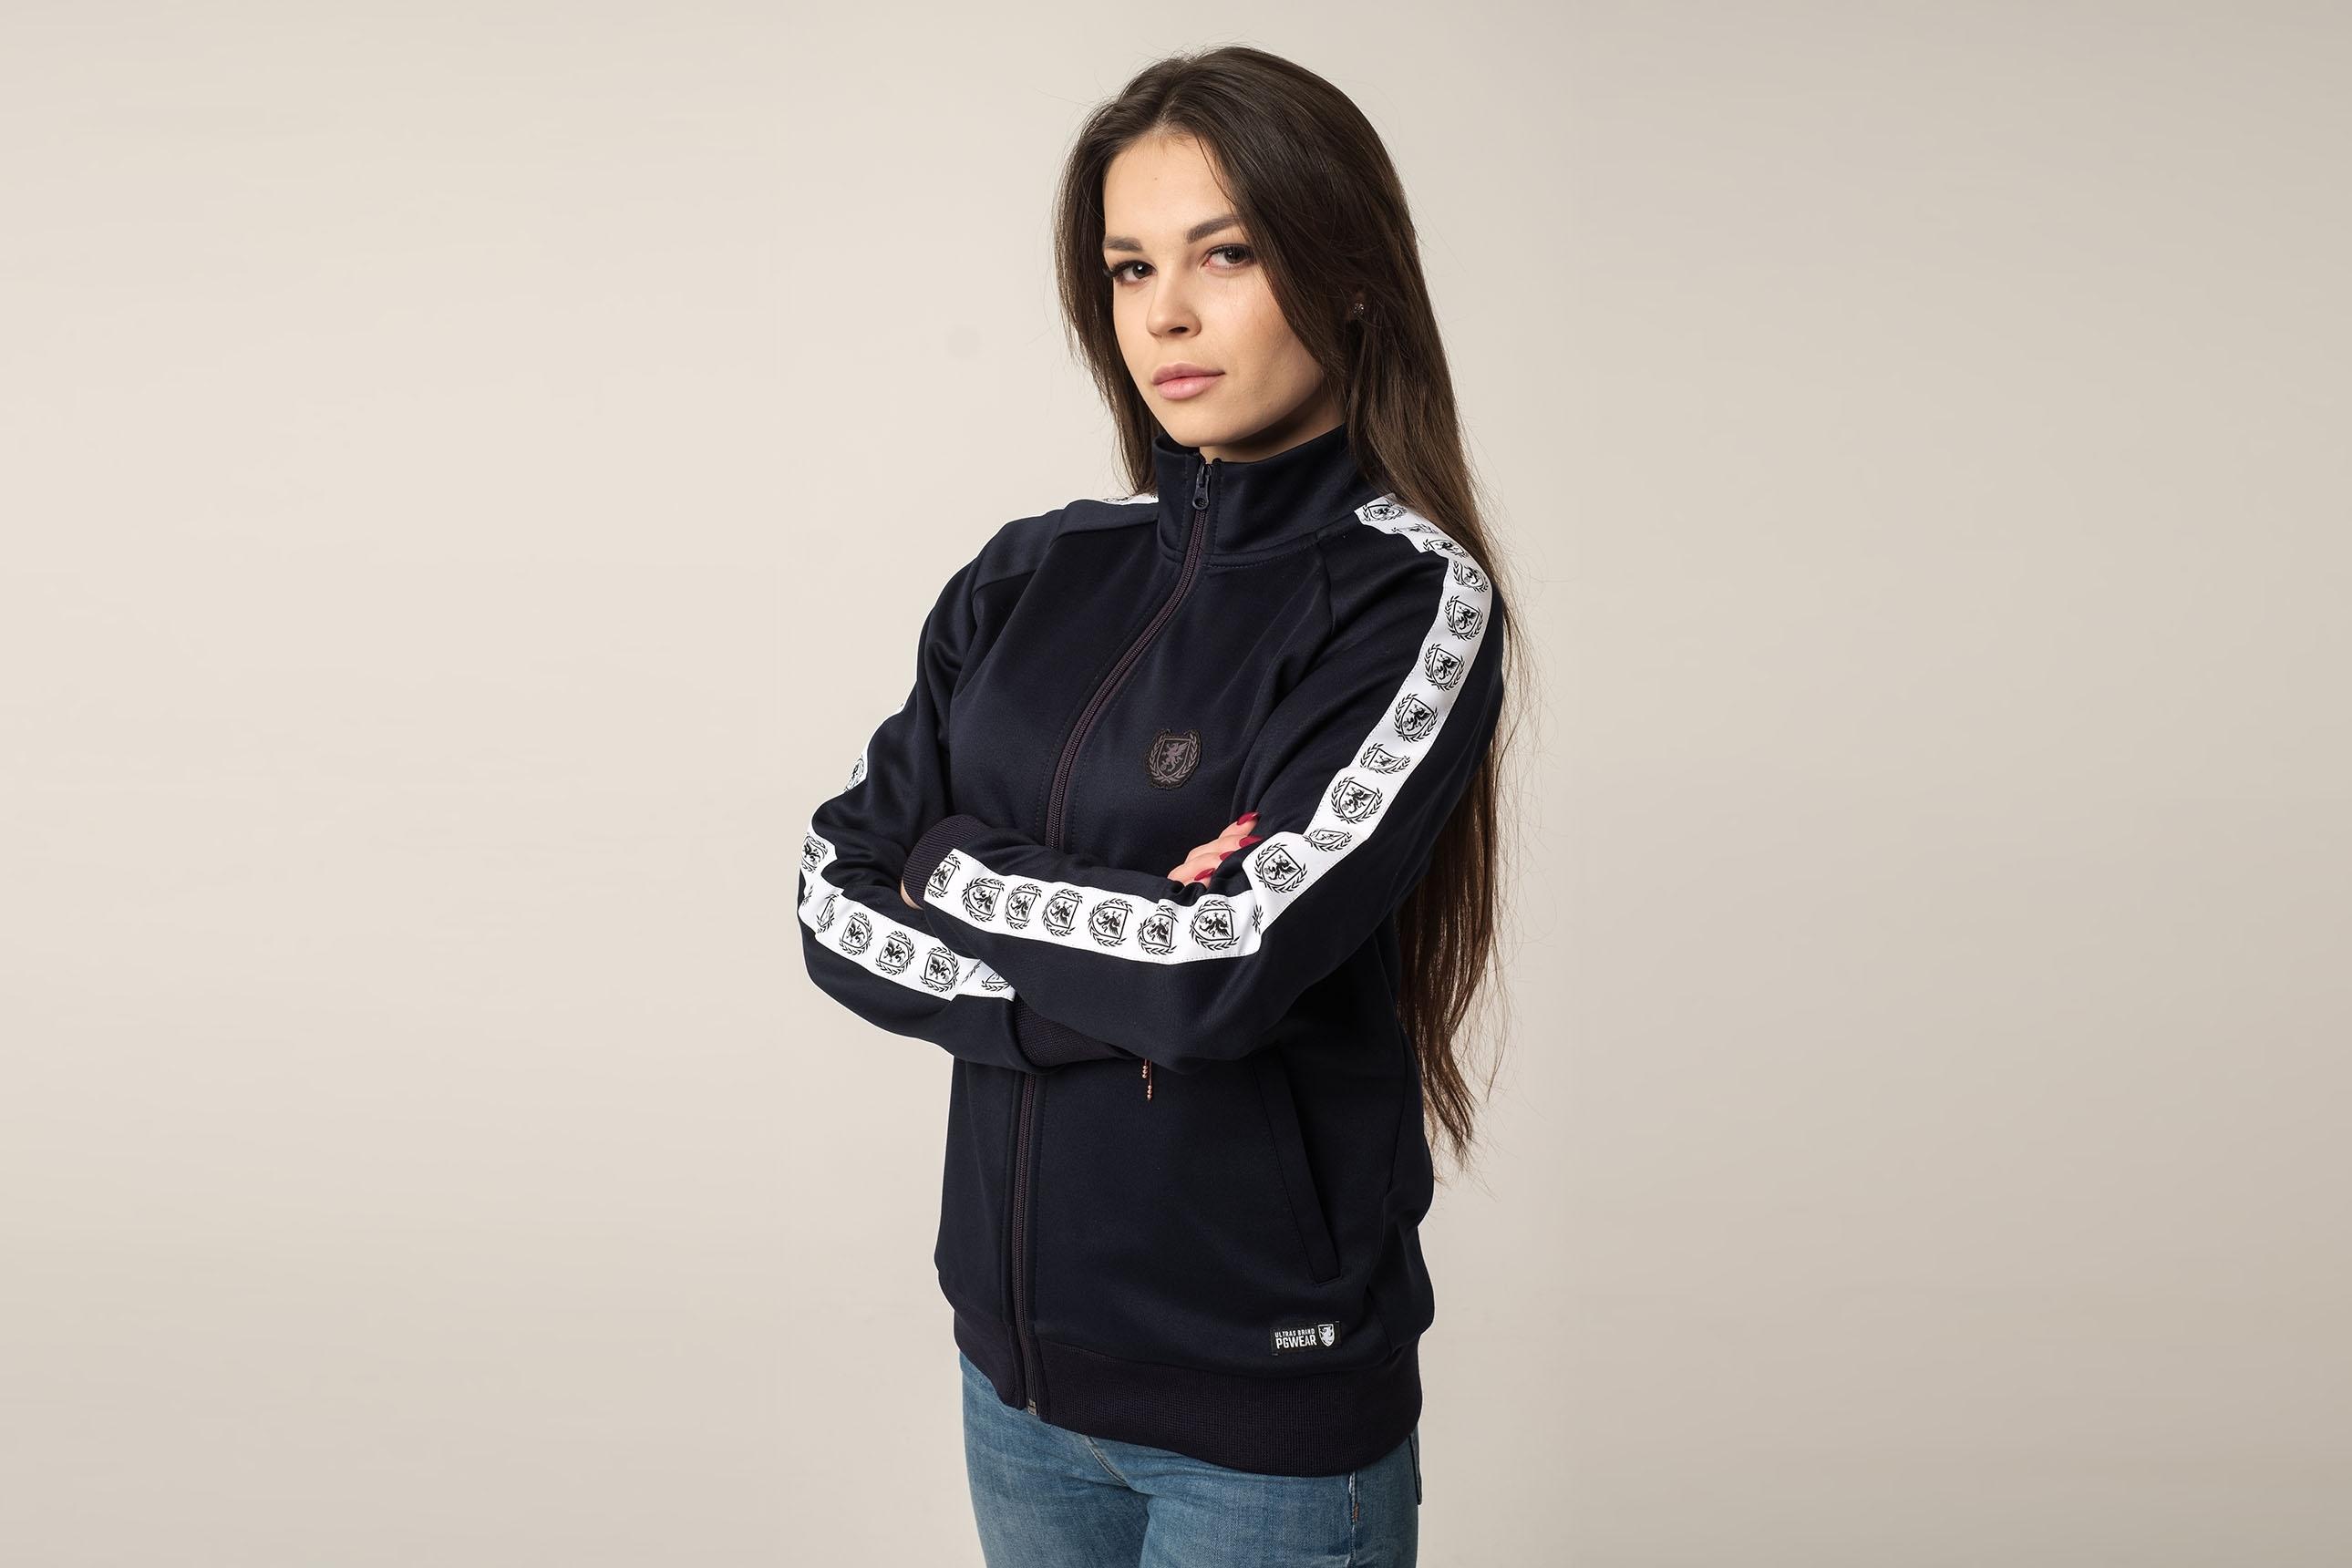 Damen Trainingsjacke Retro Supreme Navy